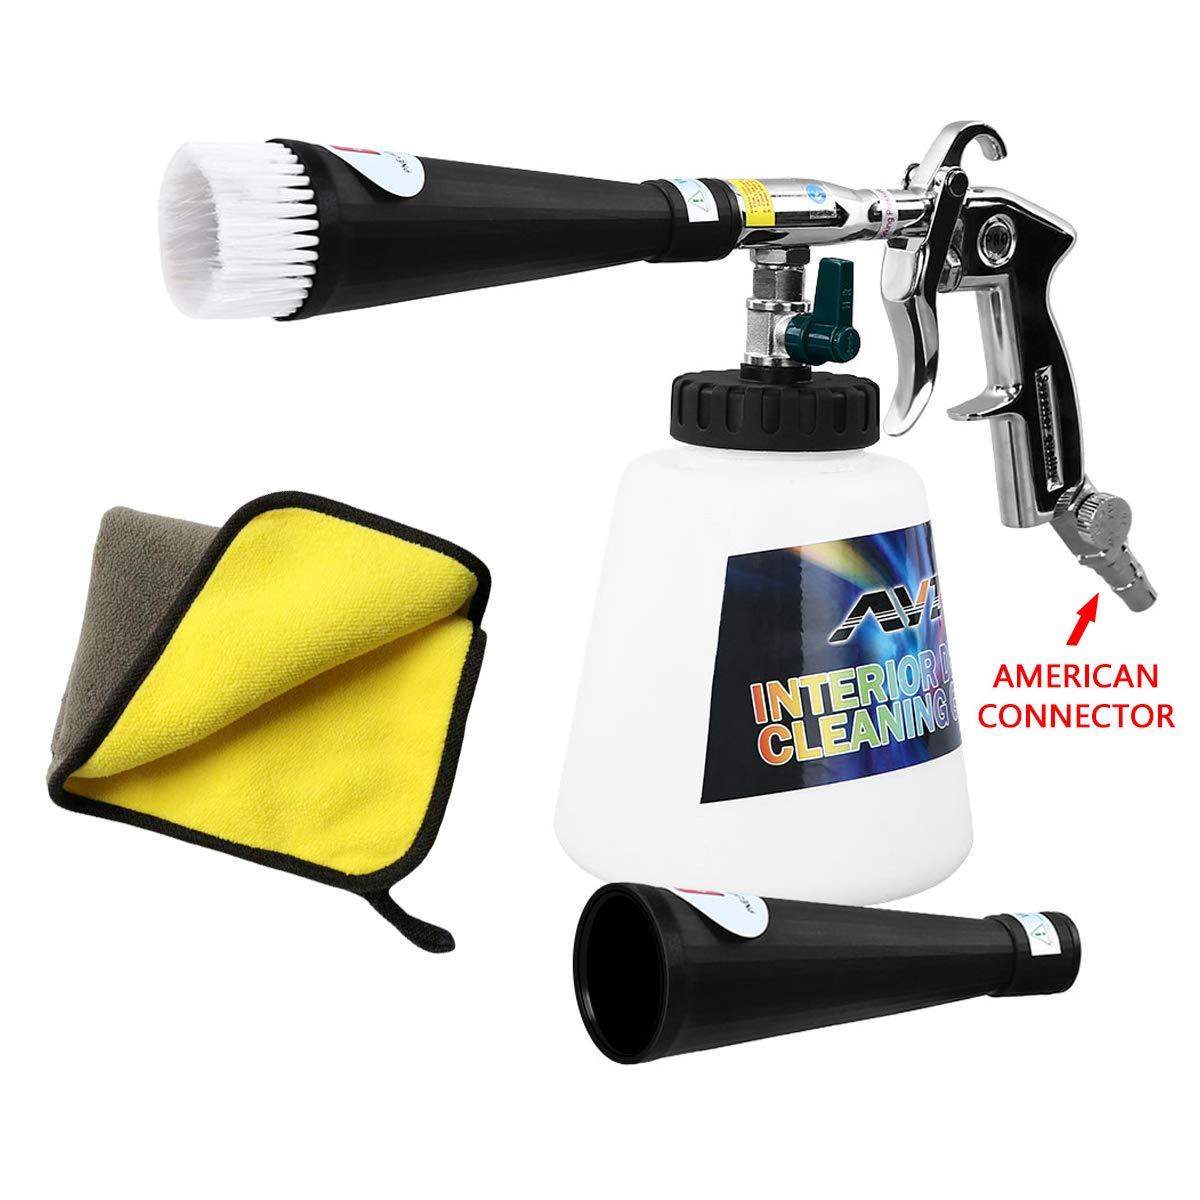 YVO Car Cleaning Gun Interior Cleaner Foam Gun Wash Kit High Pressure Washing Detailing Tool Automotive Care Essentials Fine Cleaning Device Interior Exterior